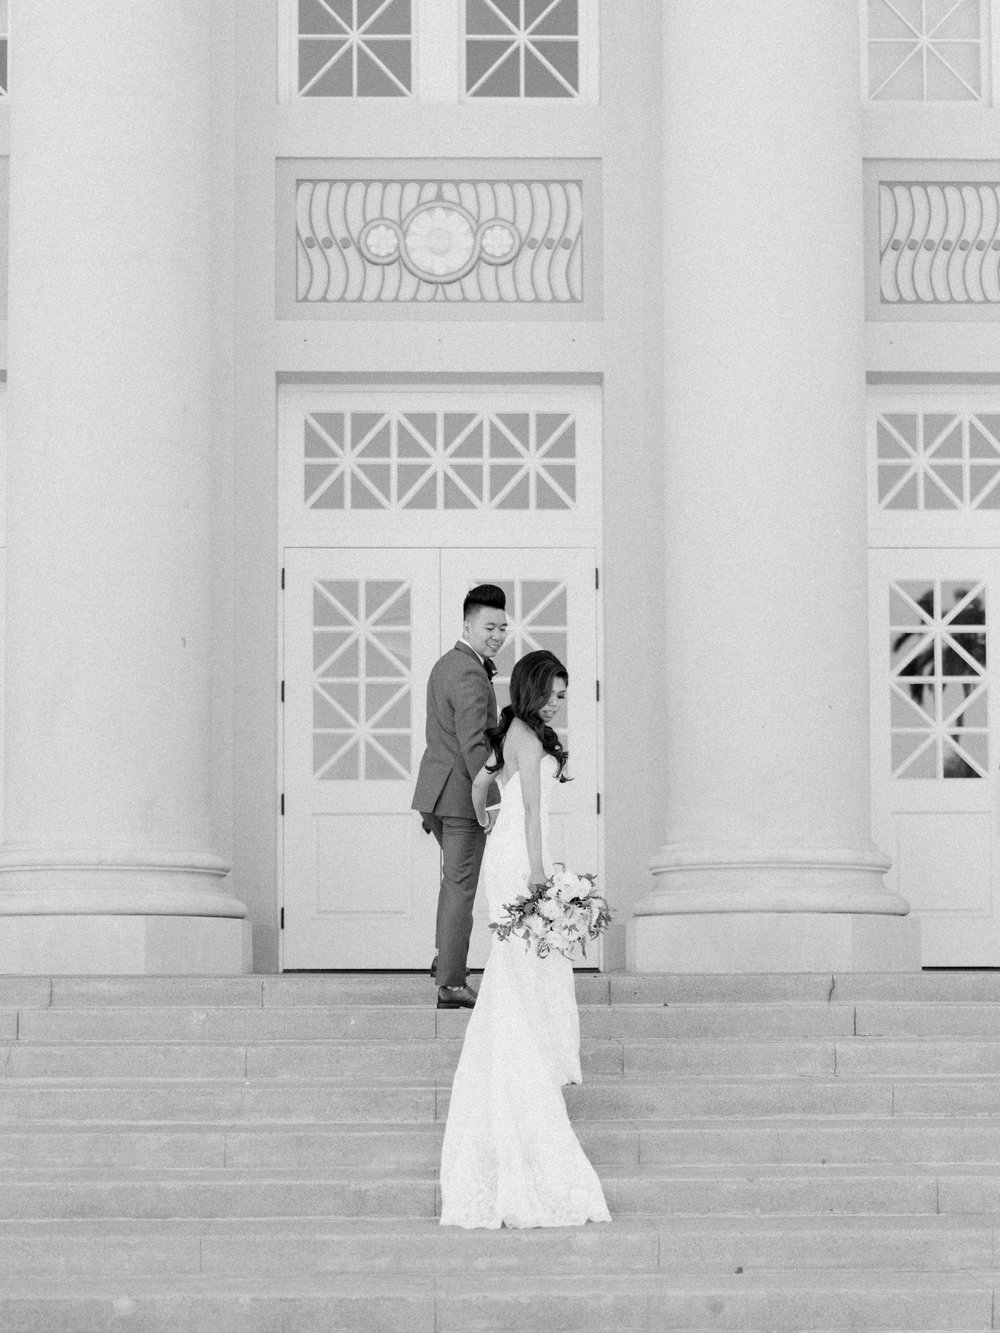 ChristineDomJonCu-Film-Wedding-Photographer3.jpg